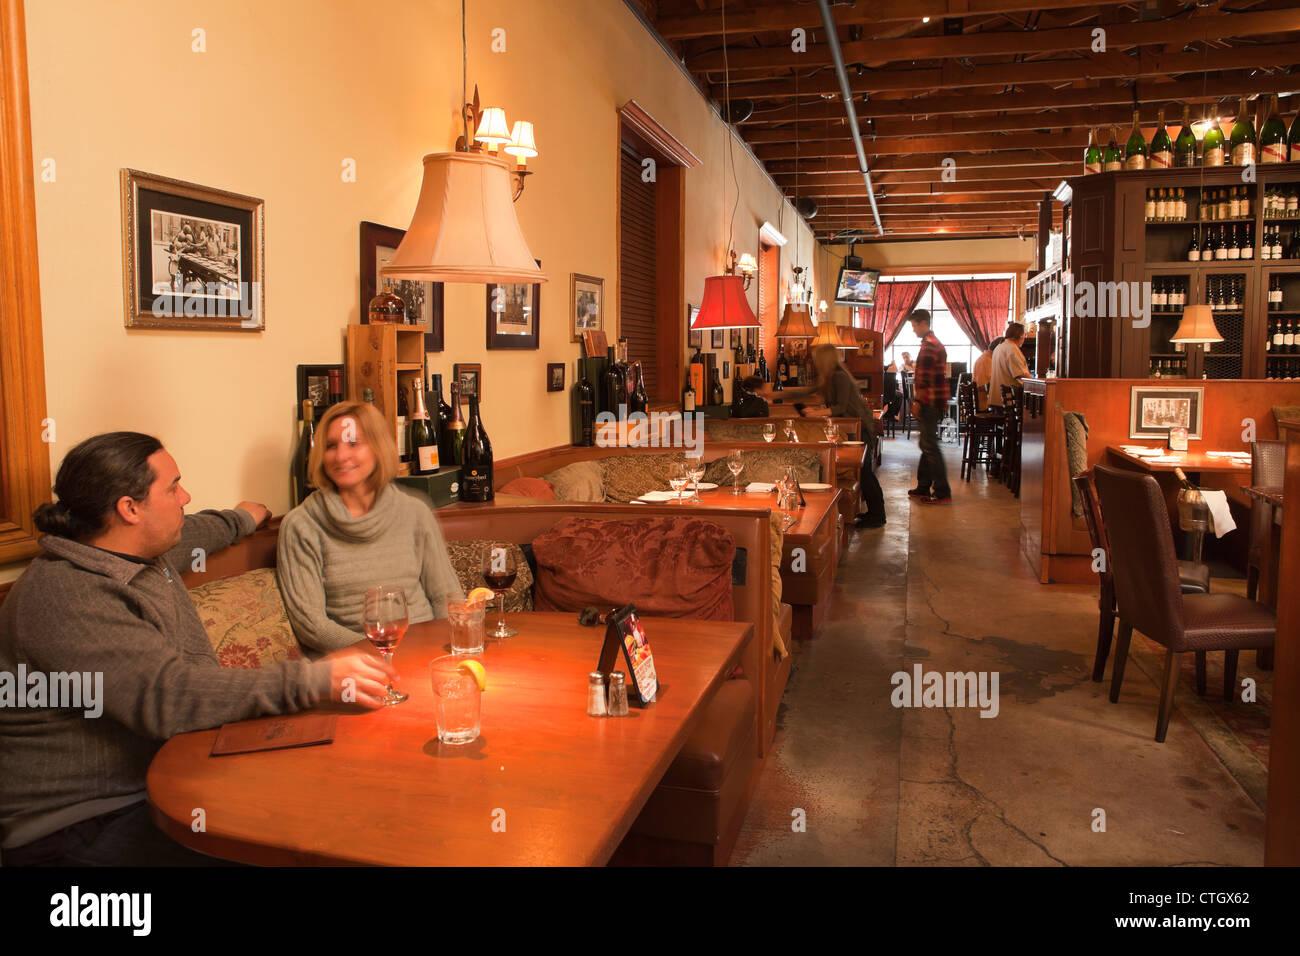 diners, Cafe Fiore, Ventura, California, United States of America - Stock Image